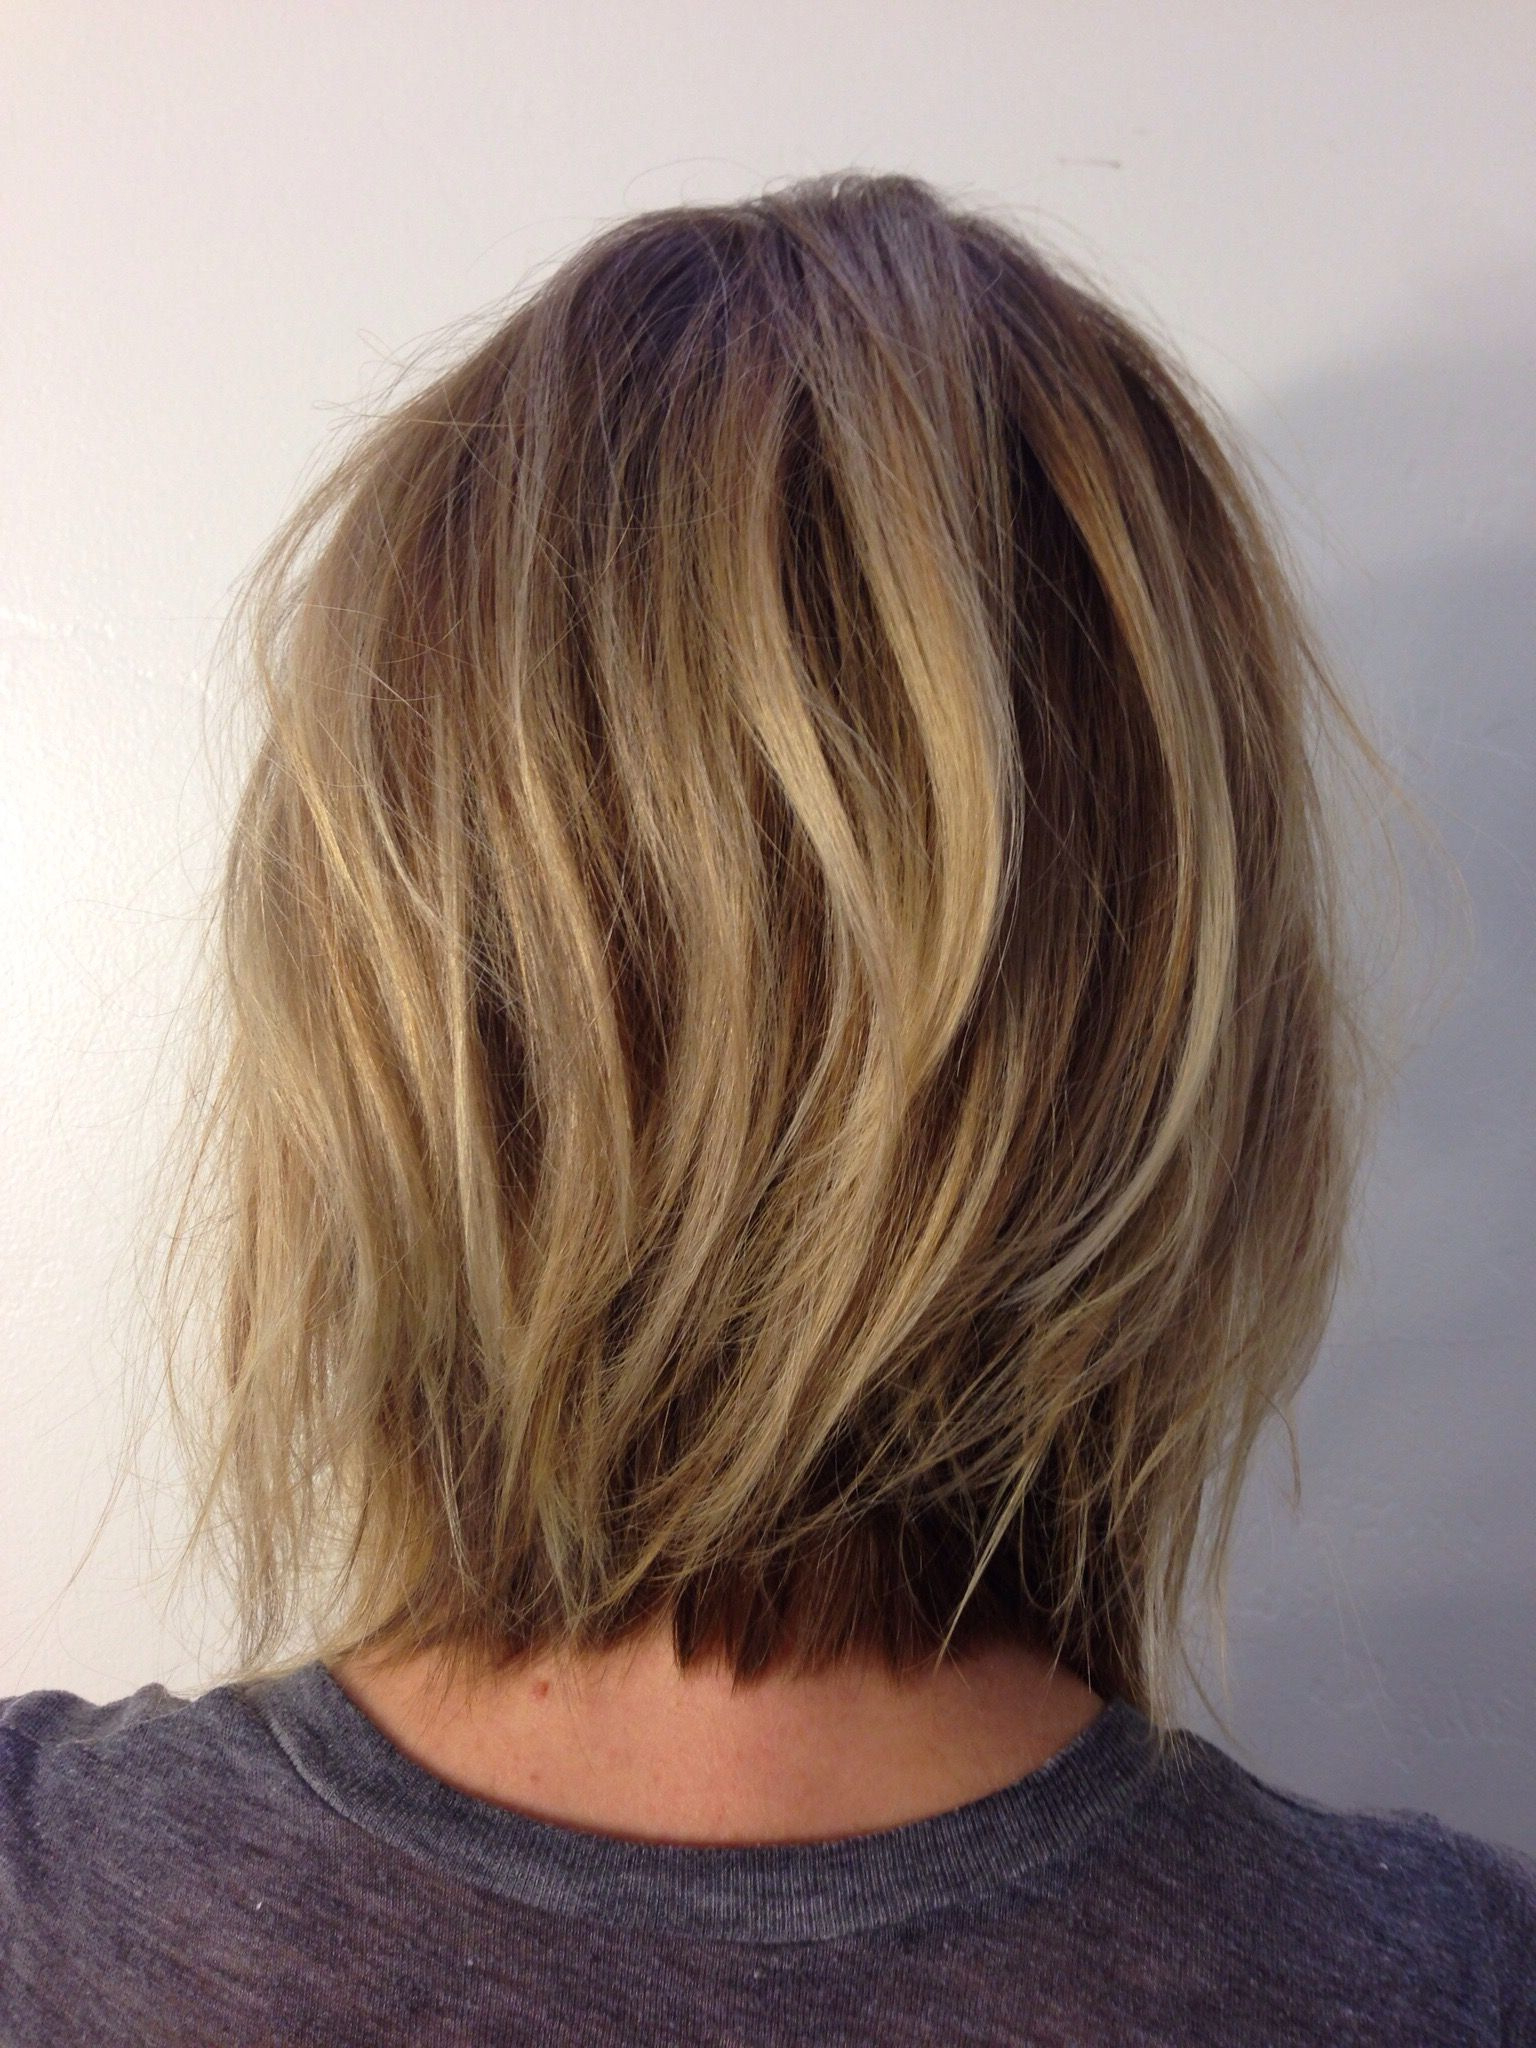 Hairstyles : Shoulder Length Choppy Bob Awe Inspiring For Shoulder Length Choppy Hairstyles (View 8 of 20)